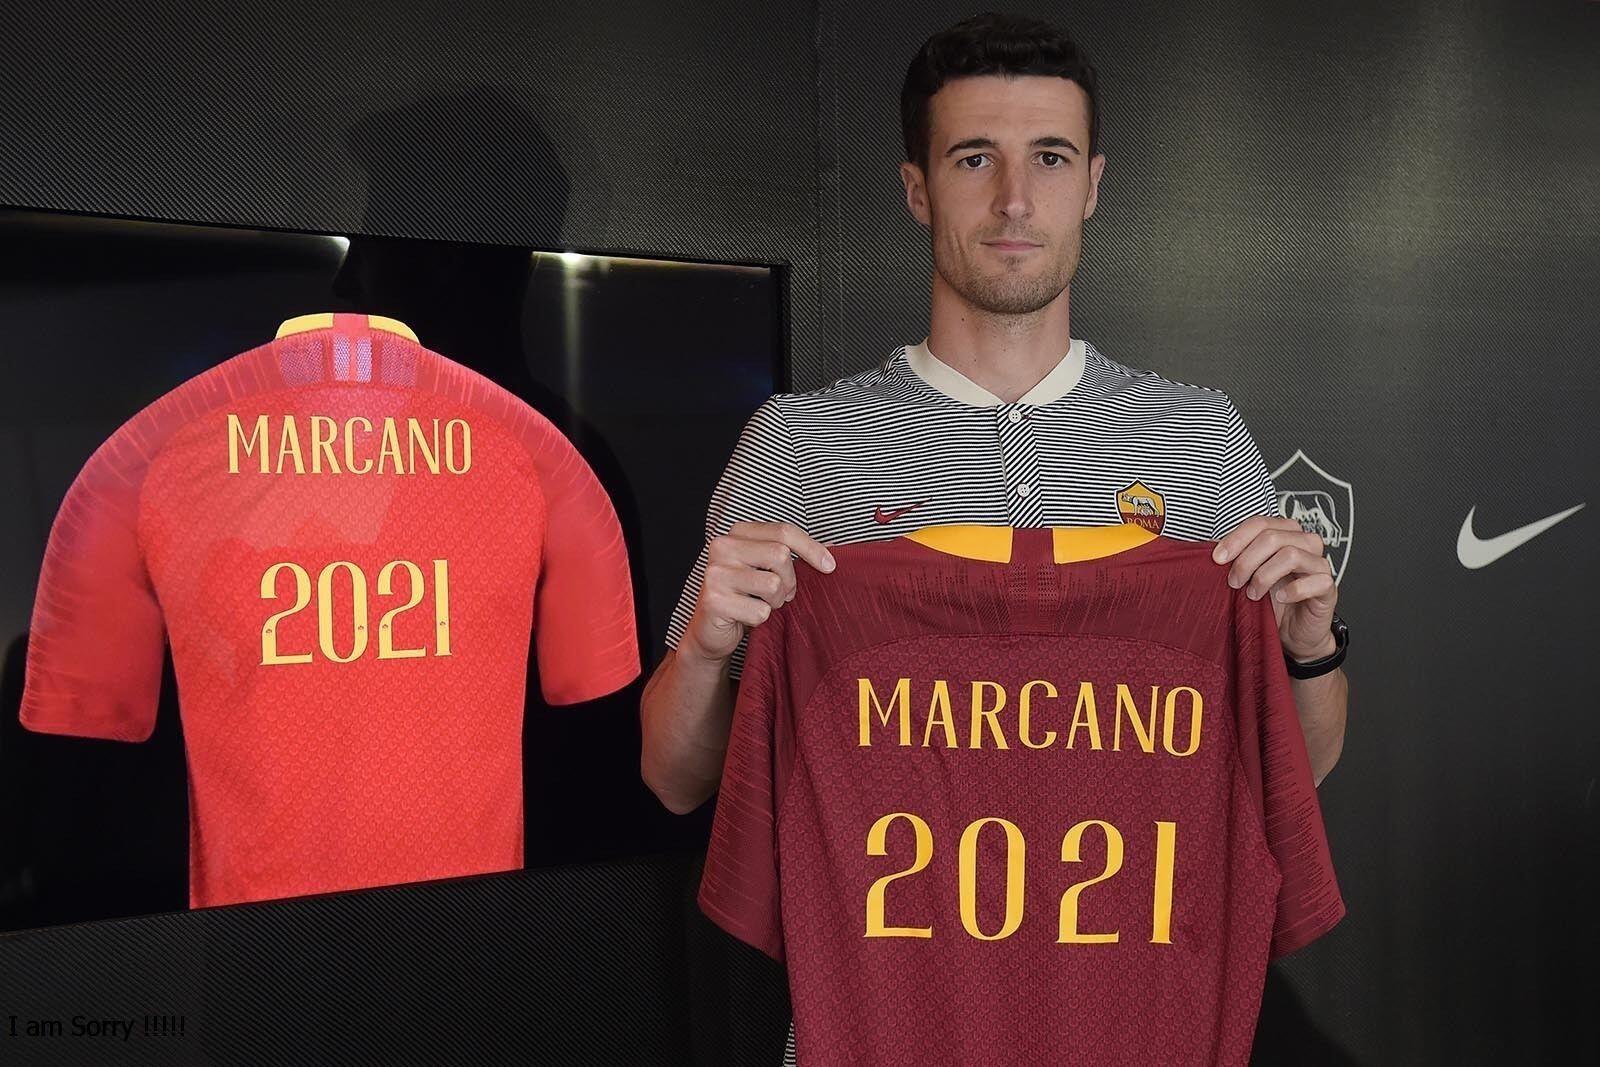 Gencar Beli Pemain, Ini Dia 3 Pemain Baru AS Roma